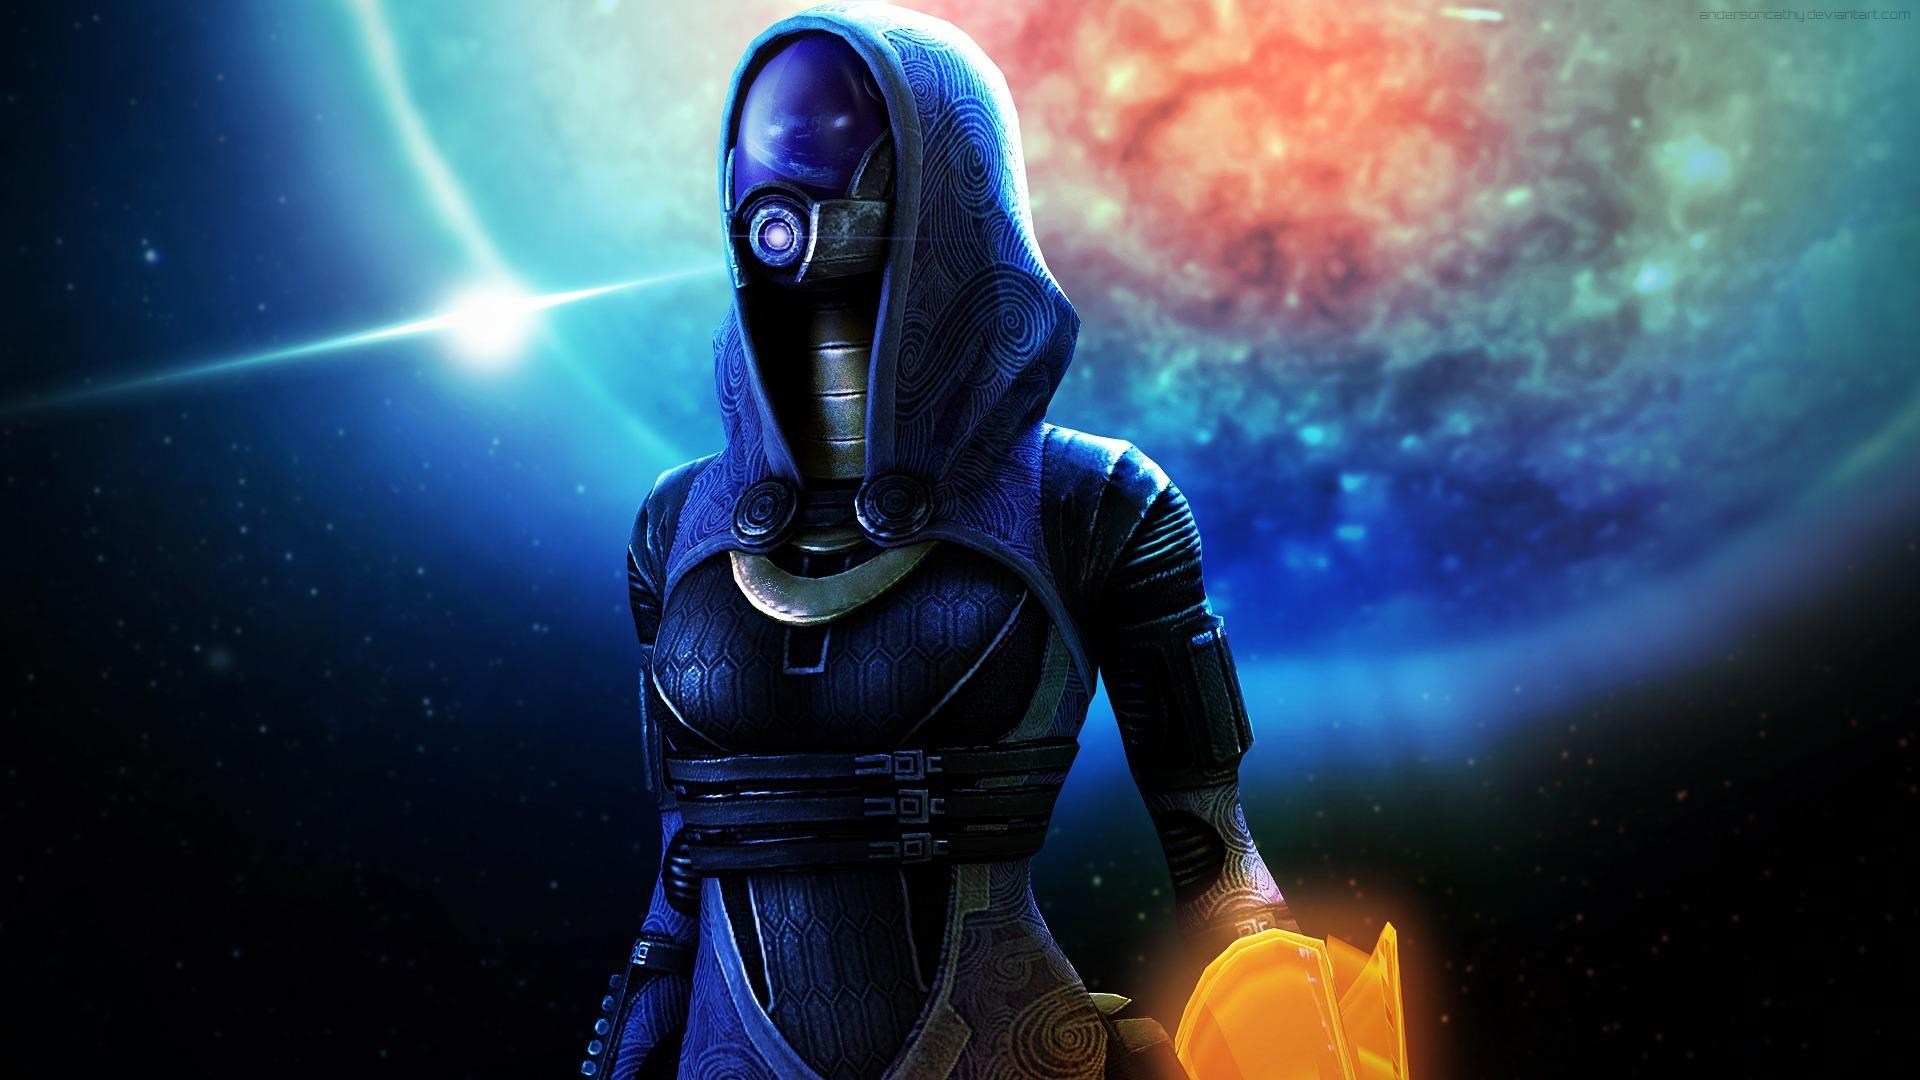 Mass Effect Tali Wallpaper Sf Wallpaper